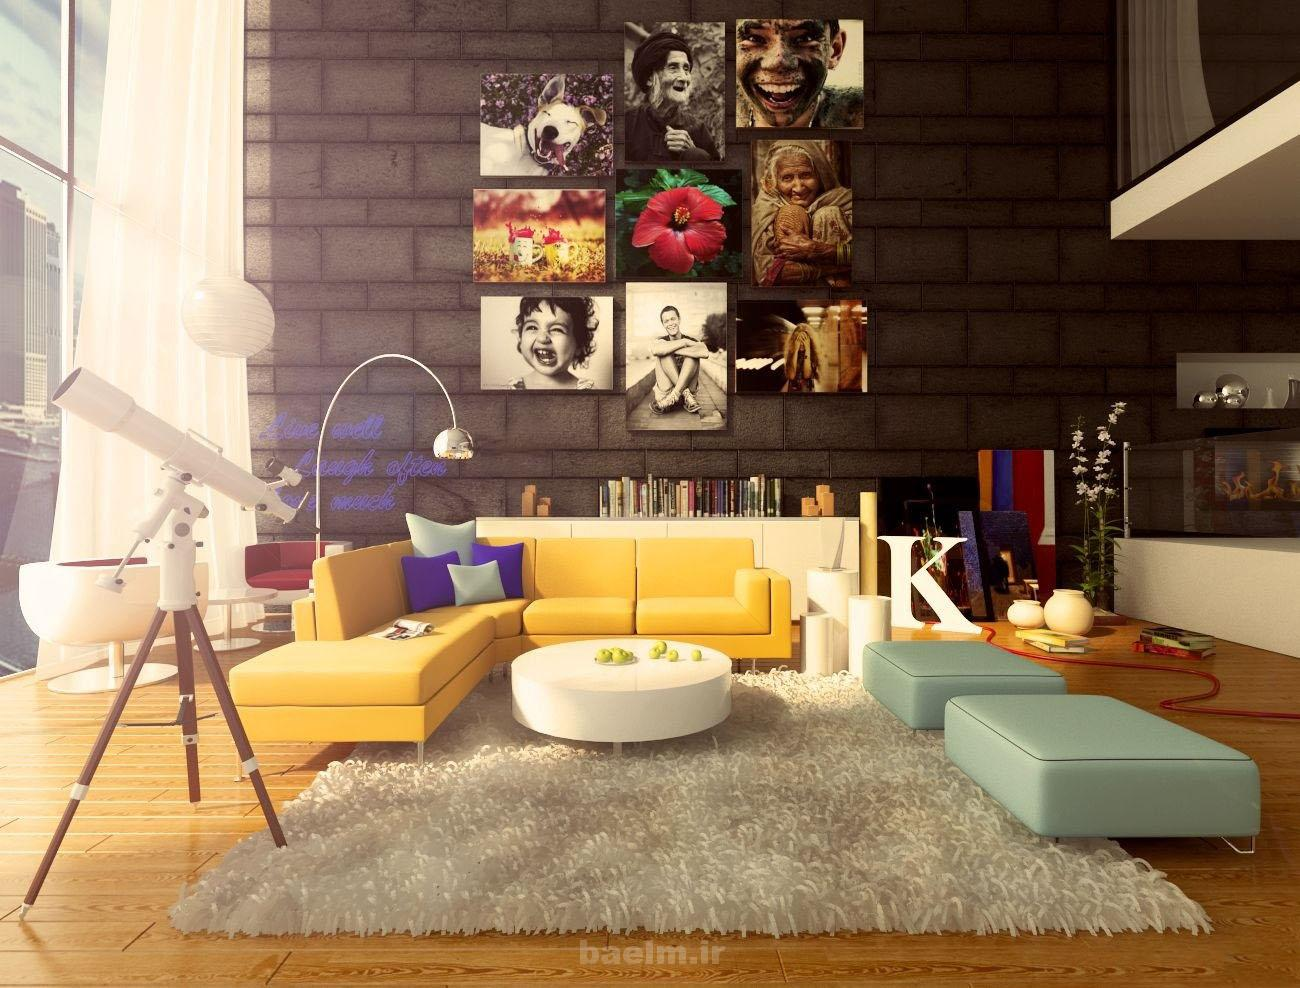 Bring color to your home 4 Bring Color To Your Home